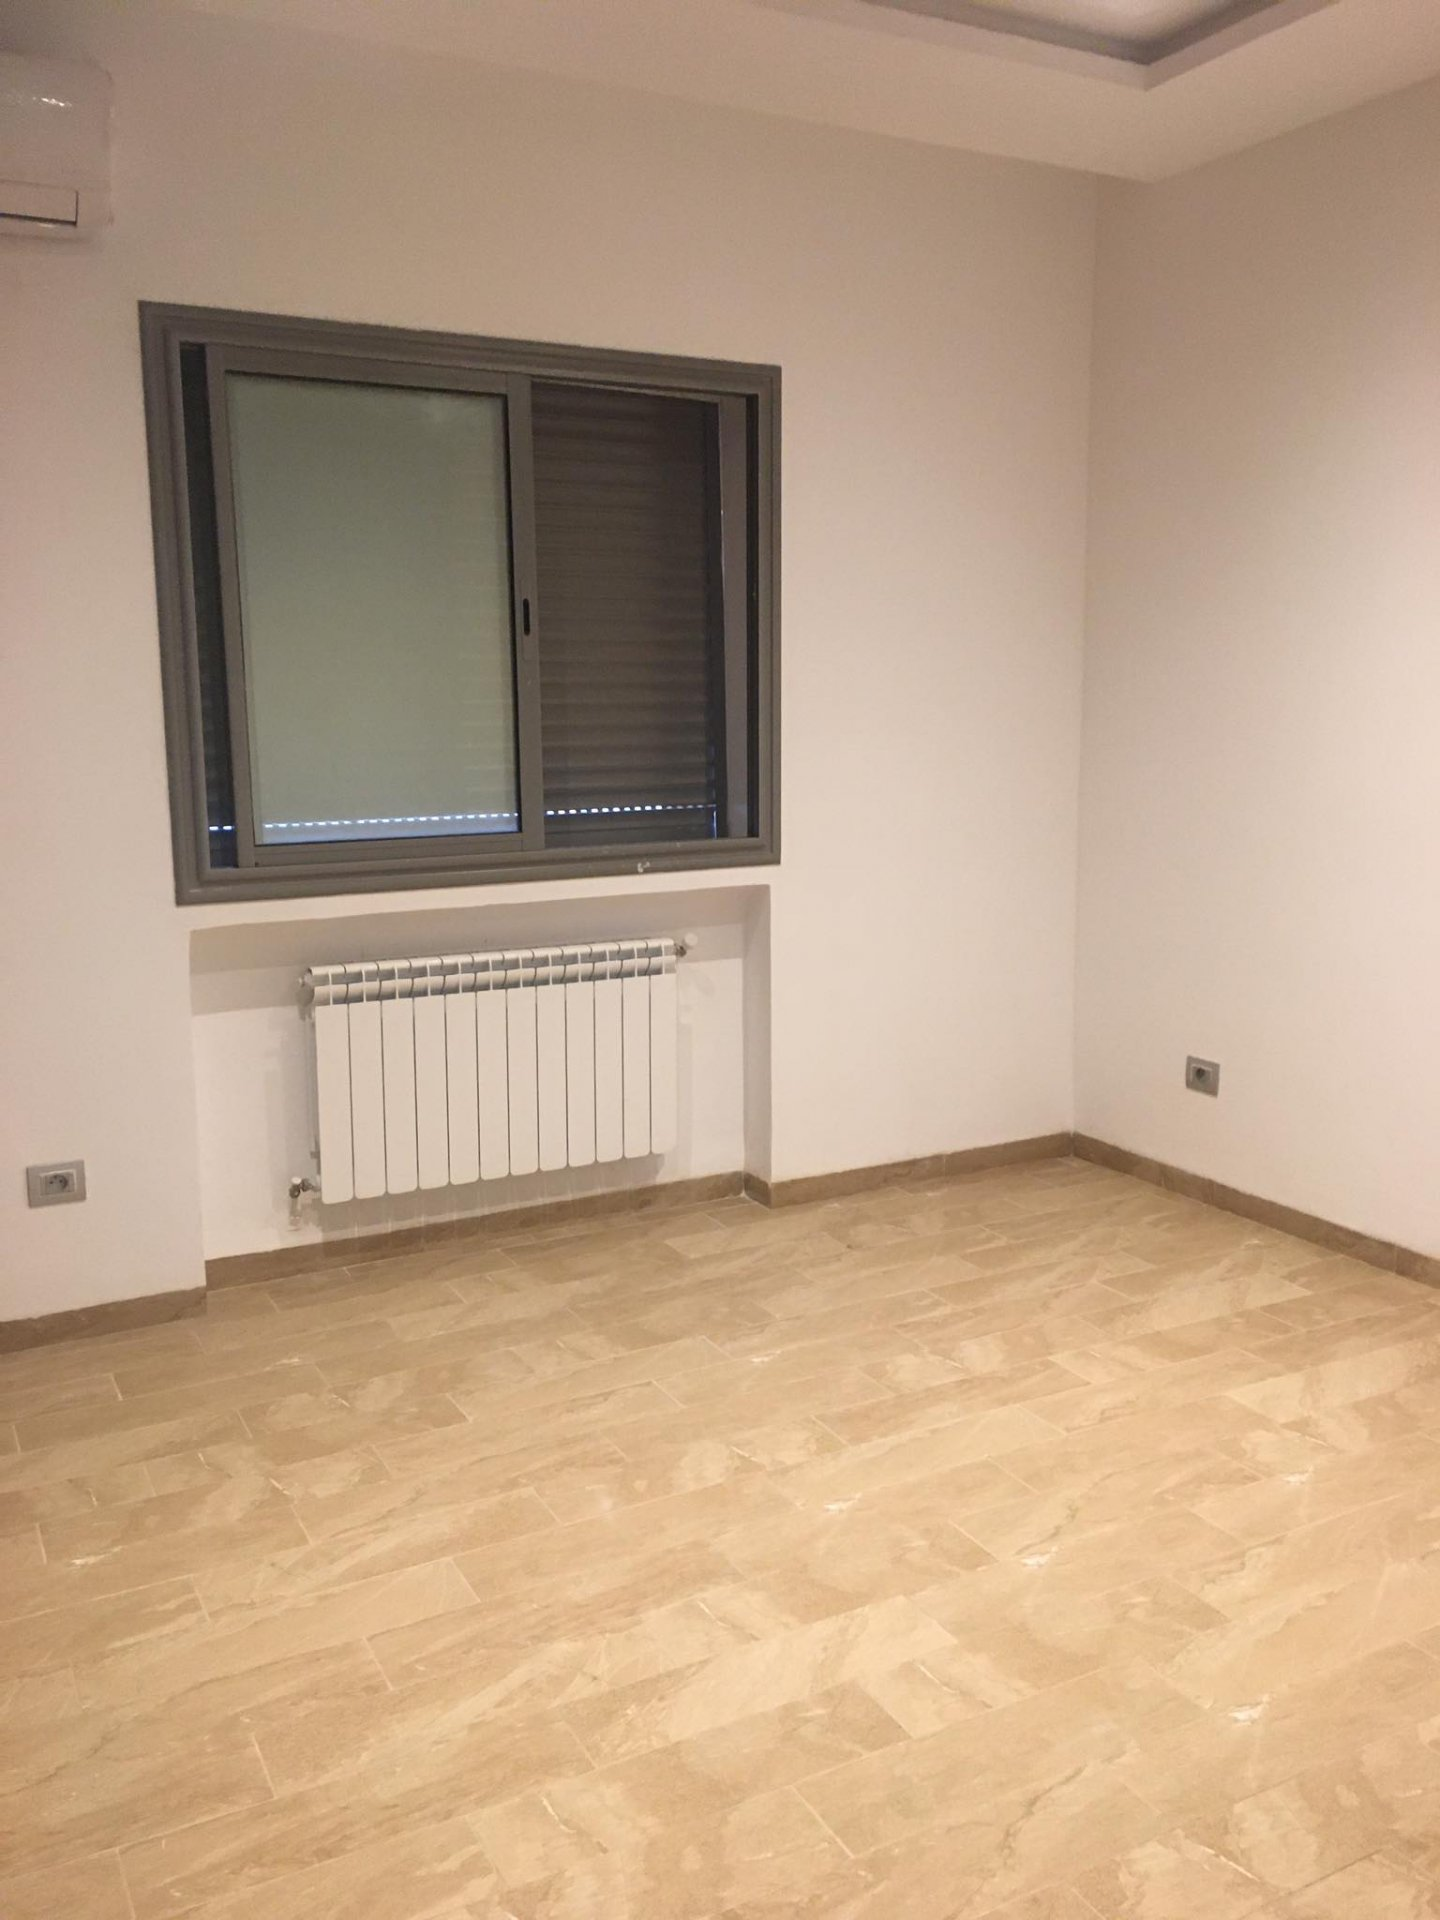 Vente Appartements S+2 Neufs - La Marsa Sidi Daoued